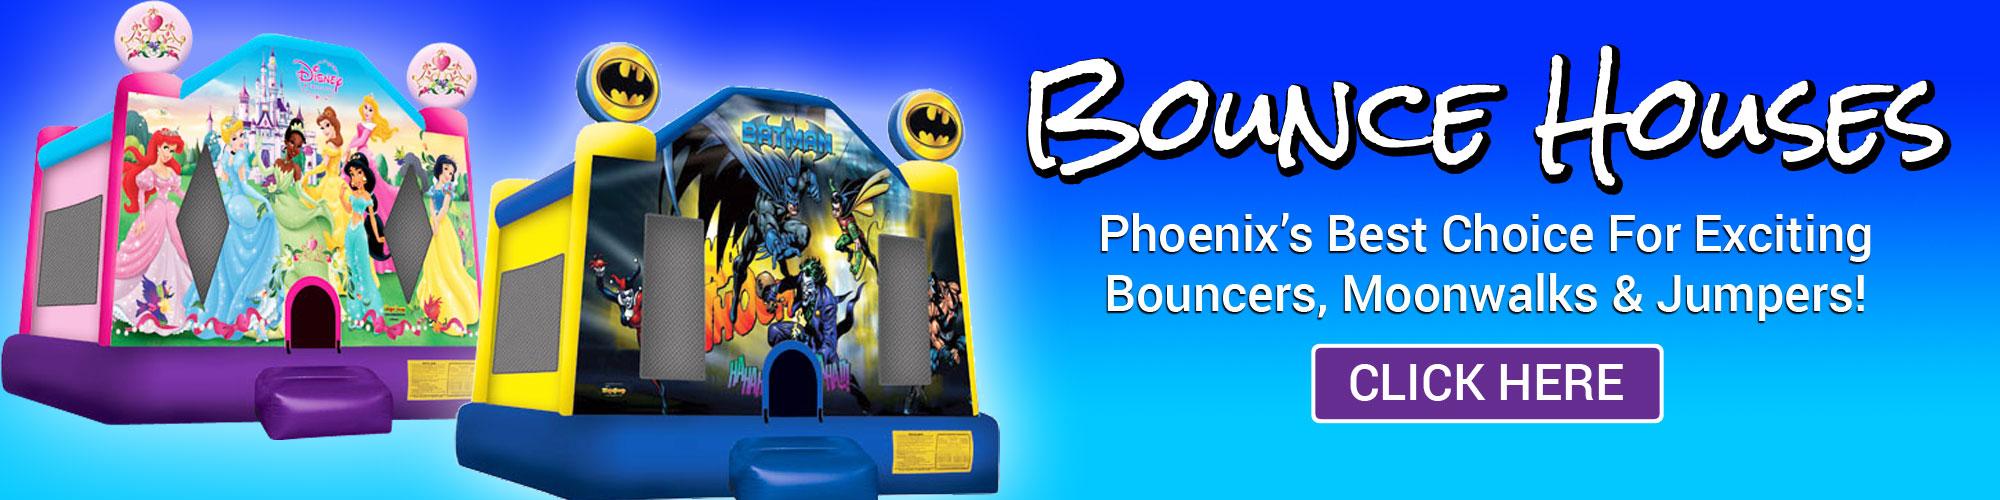 bounce house rentals Peoria AZ